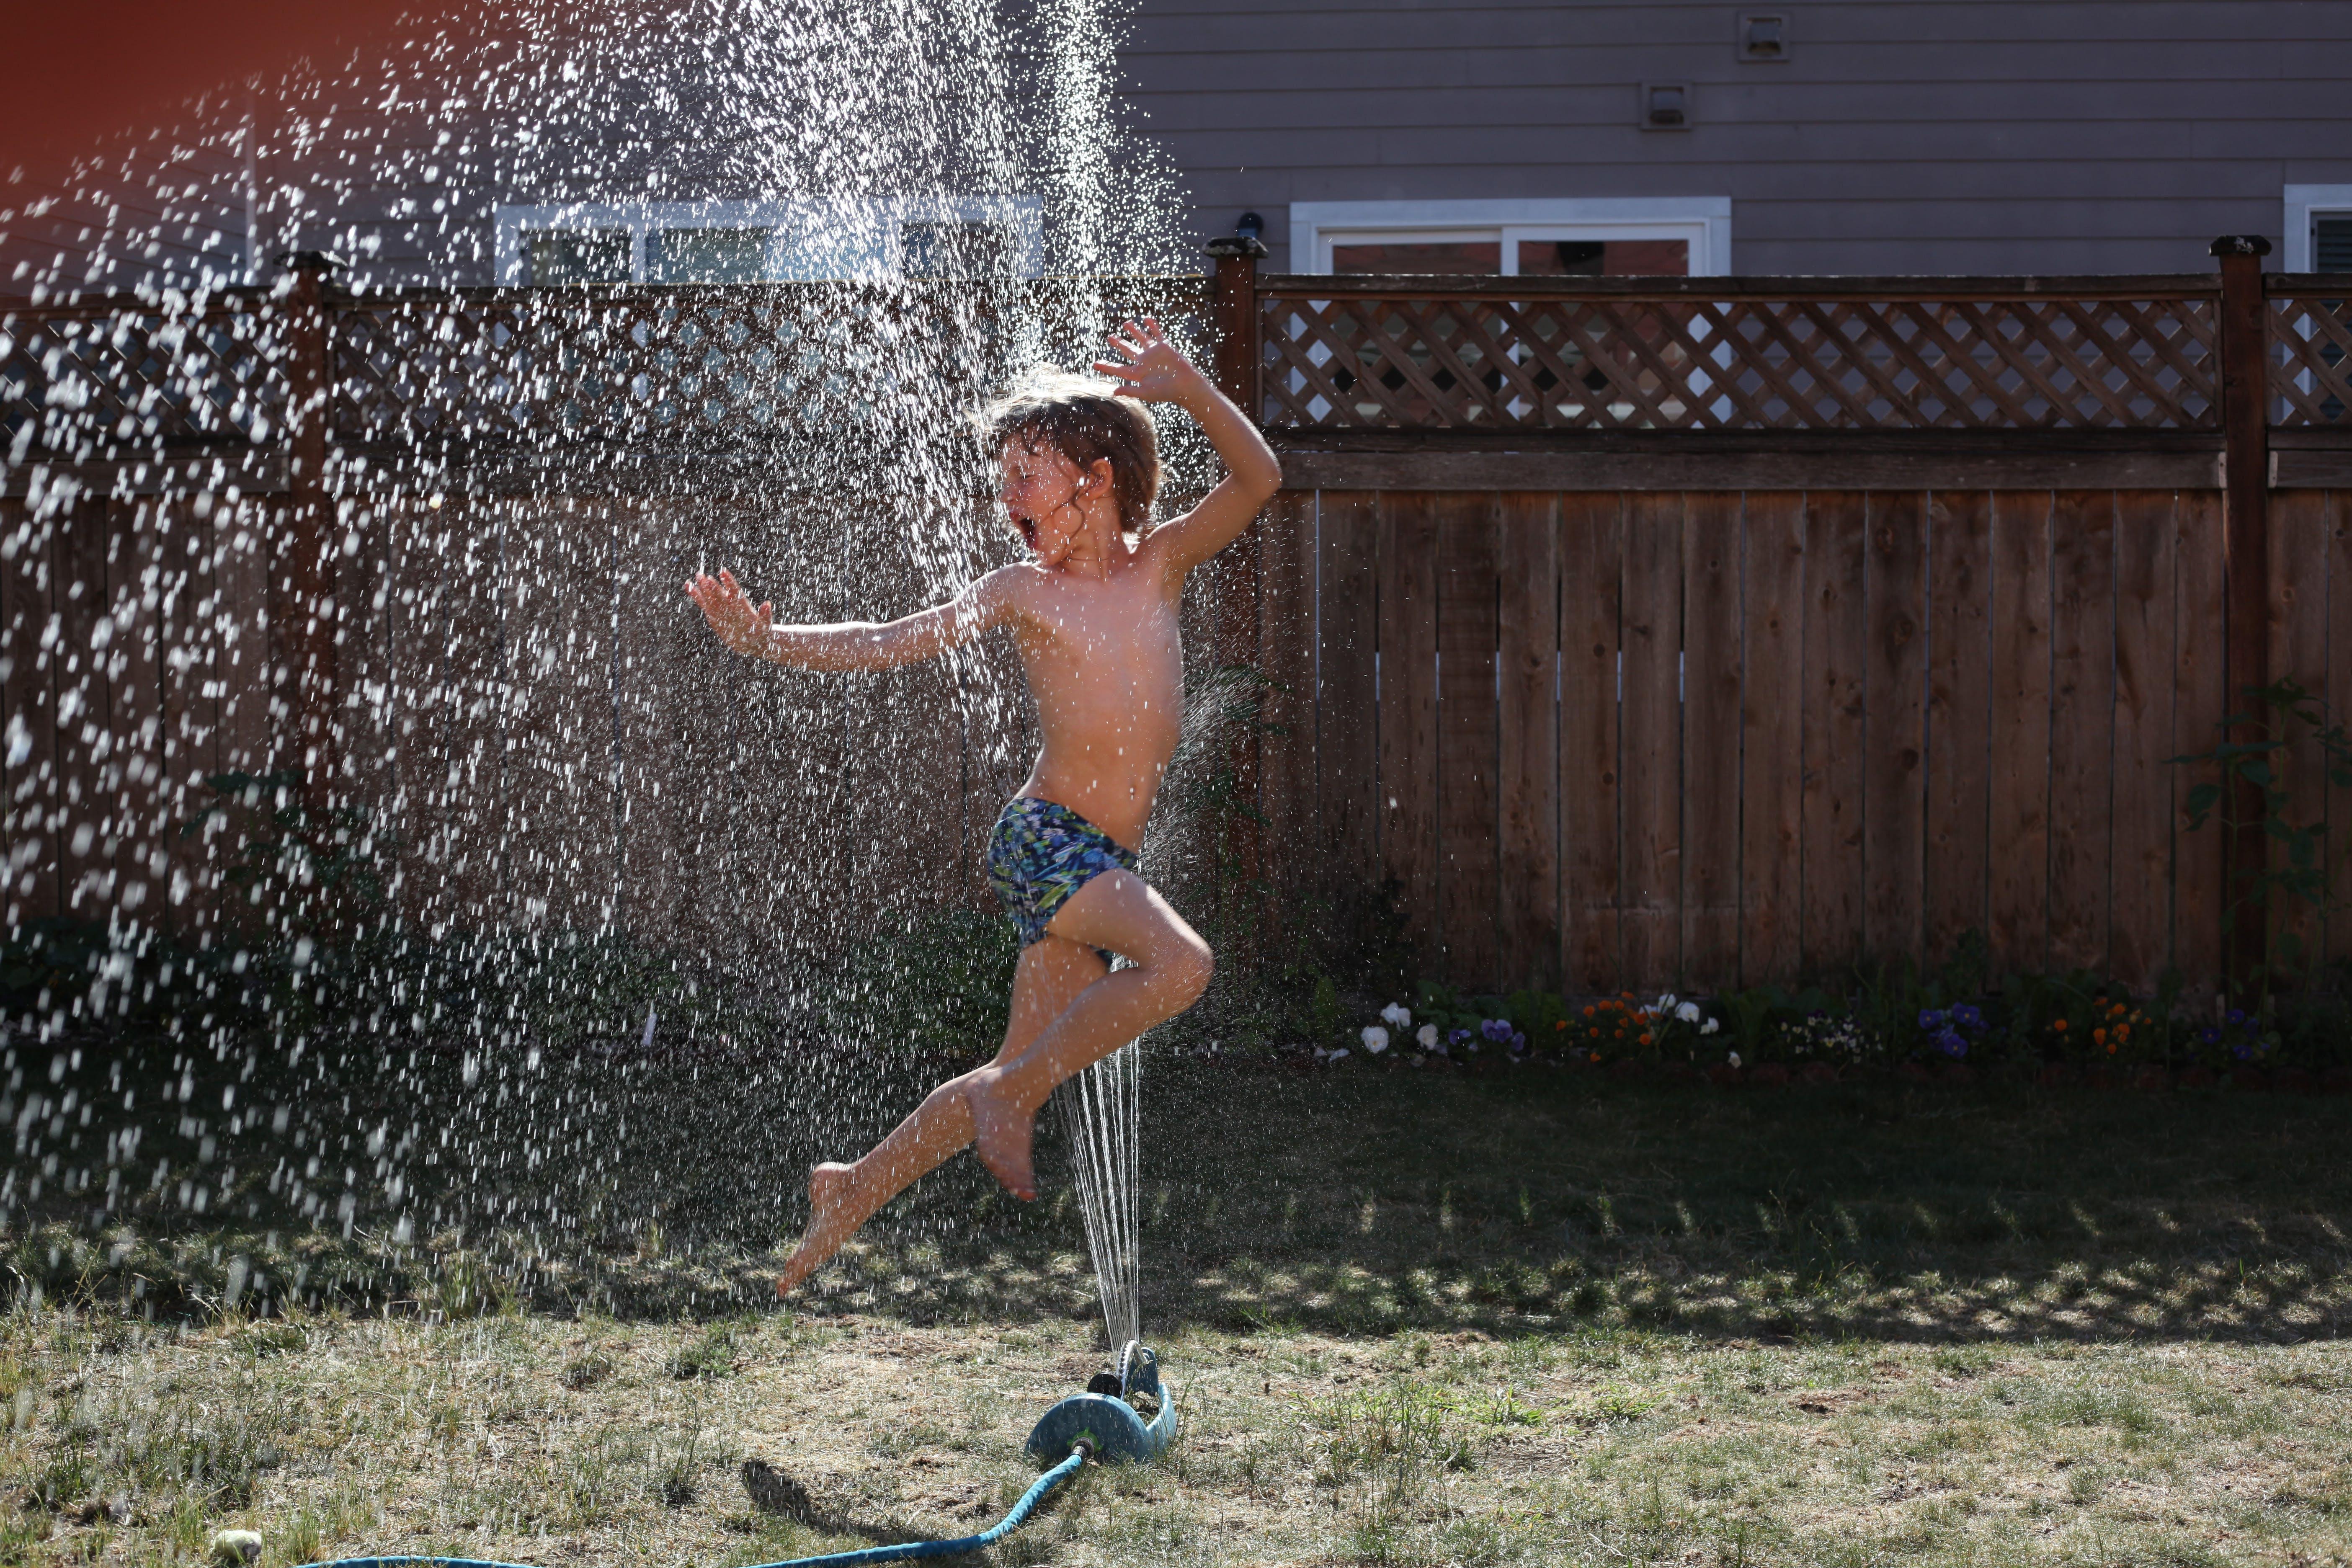 Boy Jumping on Water Sprinkler